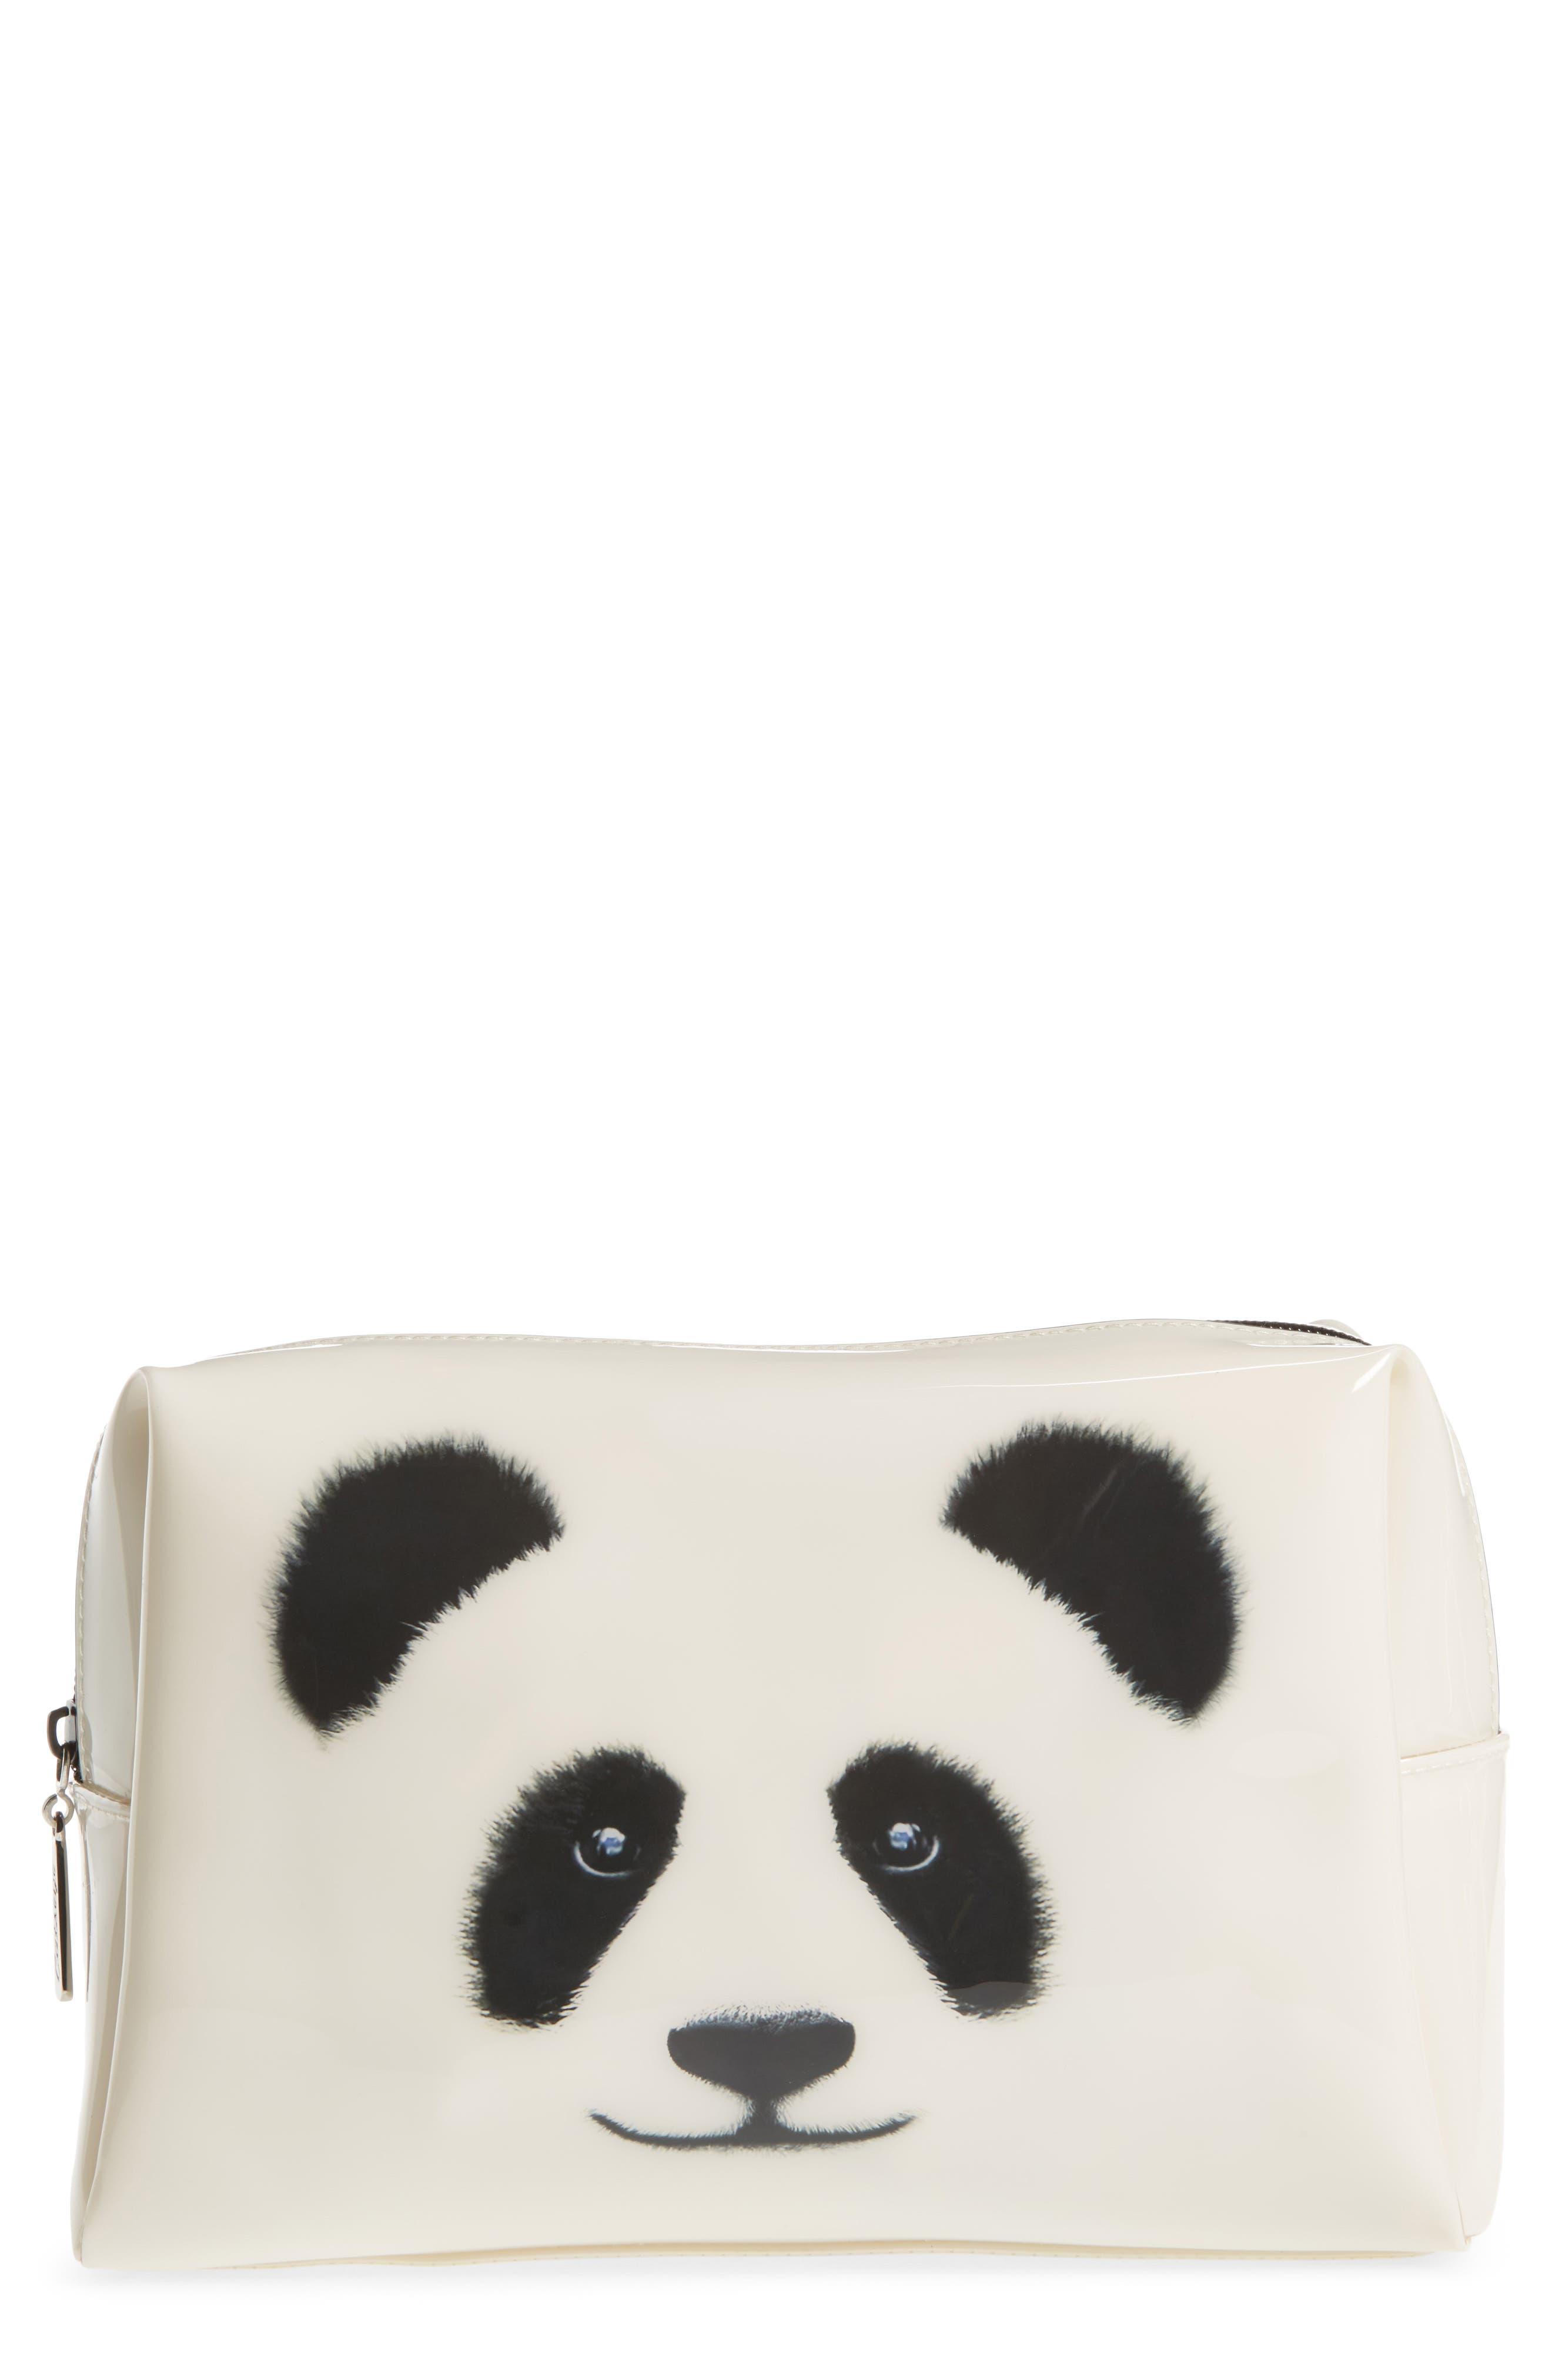 Alternate Image 1 Selected - Catseye London Big Face Panda Large Cosmetics Case